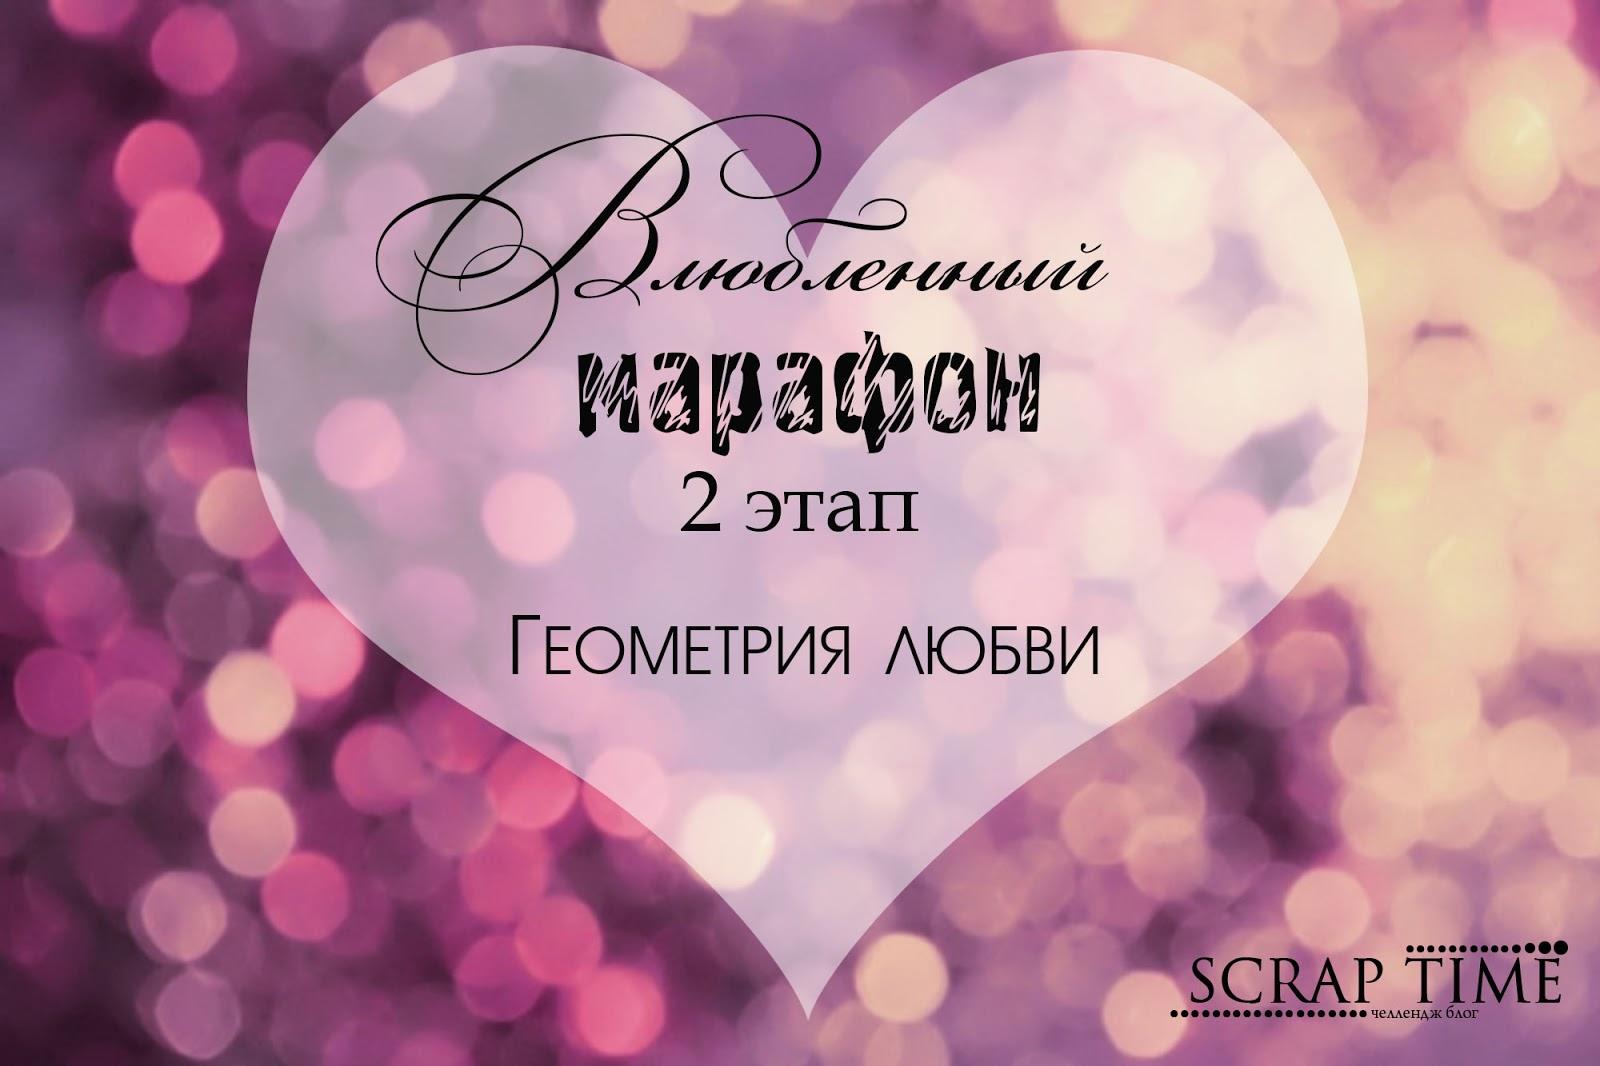 http://4scraptime.blogspot.com/2015/01/2.html